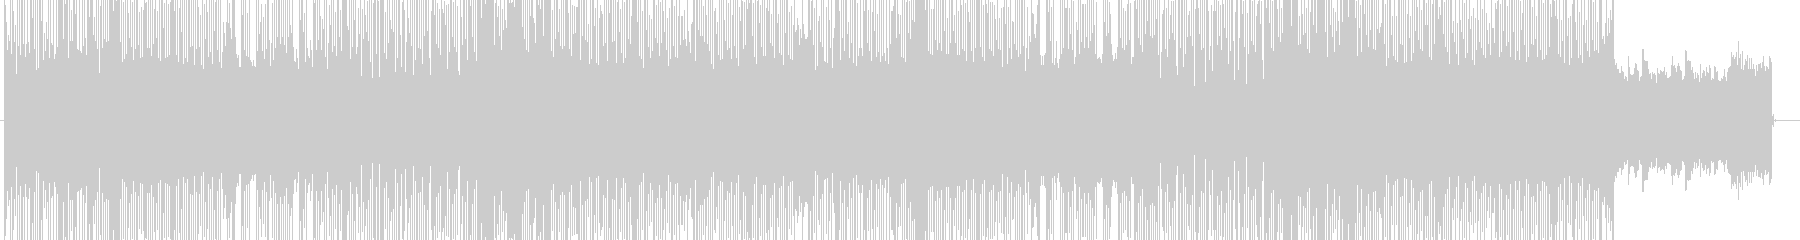 「HR/HM」「ROCK」BGM186の未再生の波形